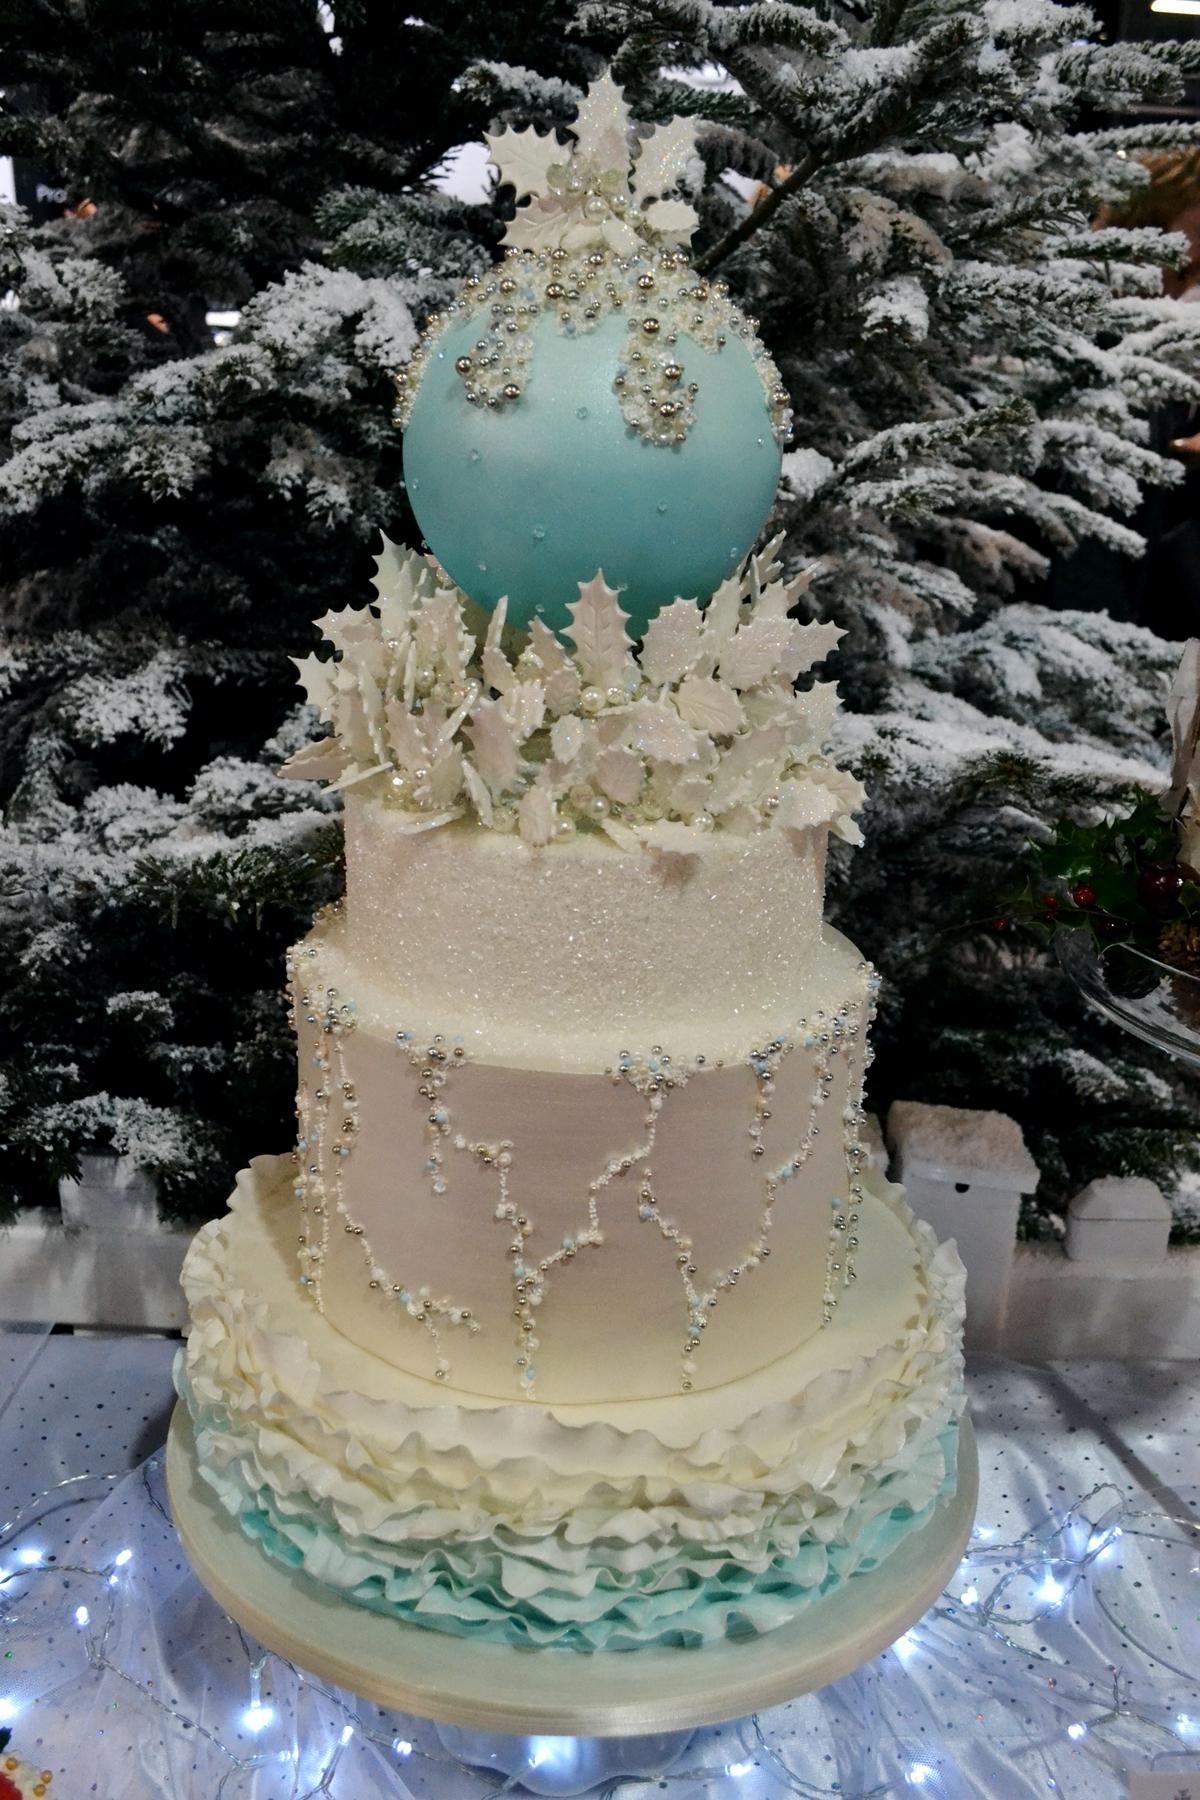 cake and bake show event city manchester 2016 wedding cake